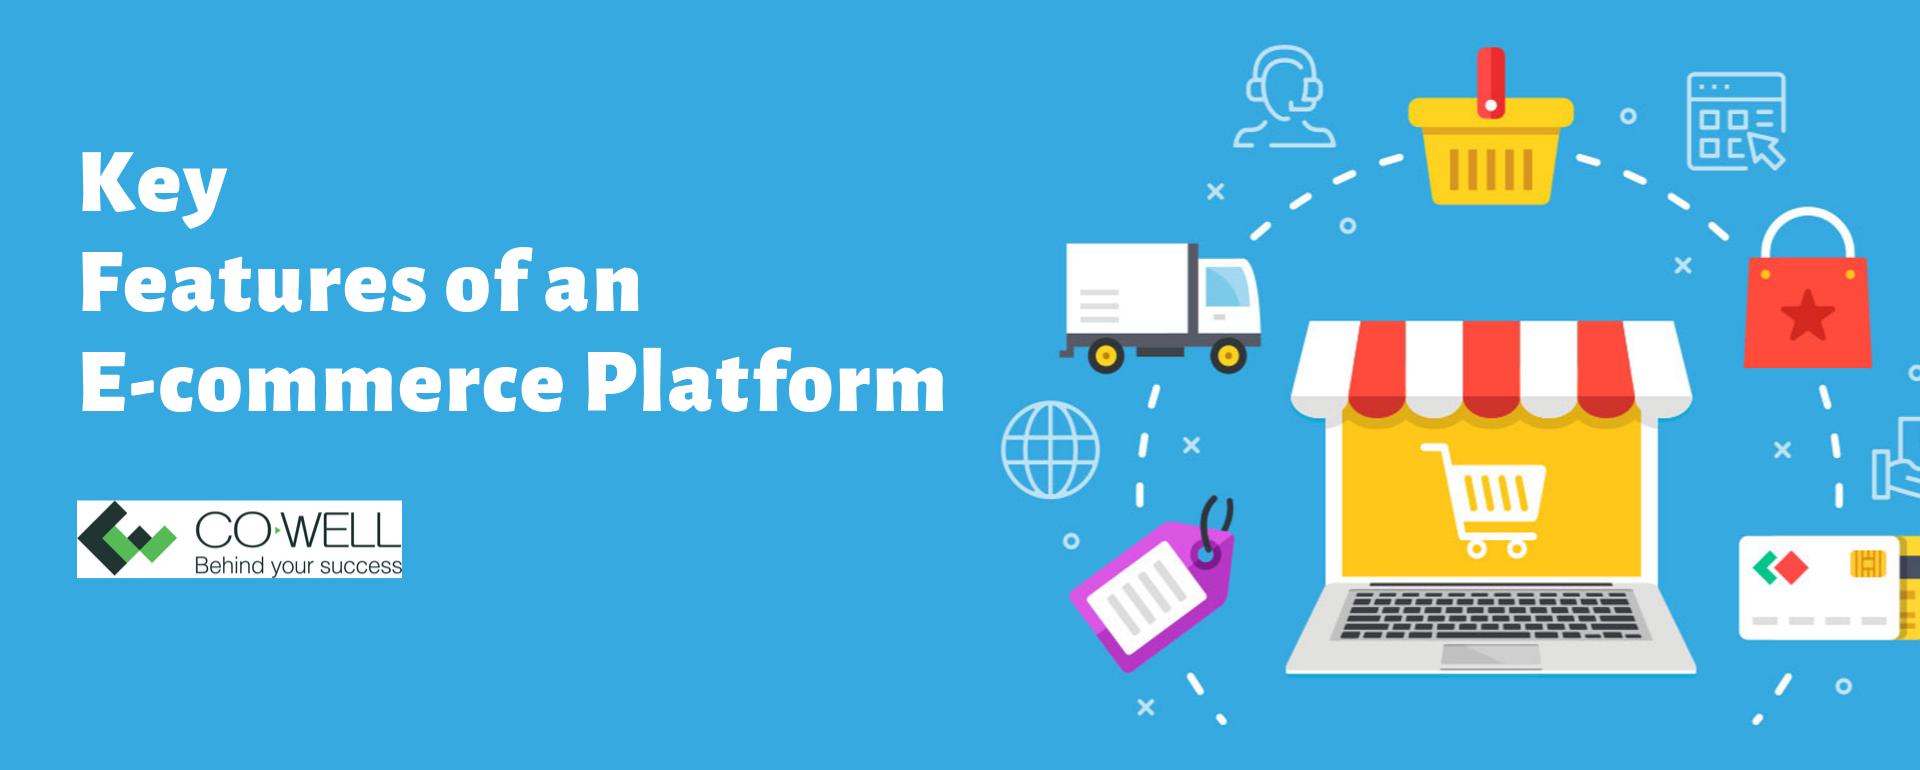 Key Features of an E commerce Platform